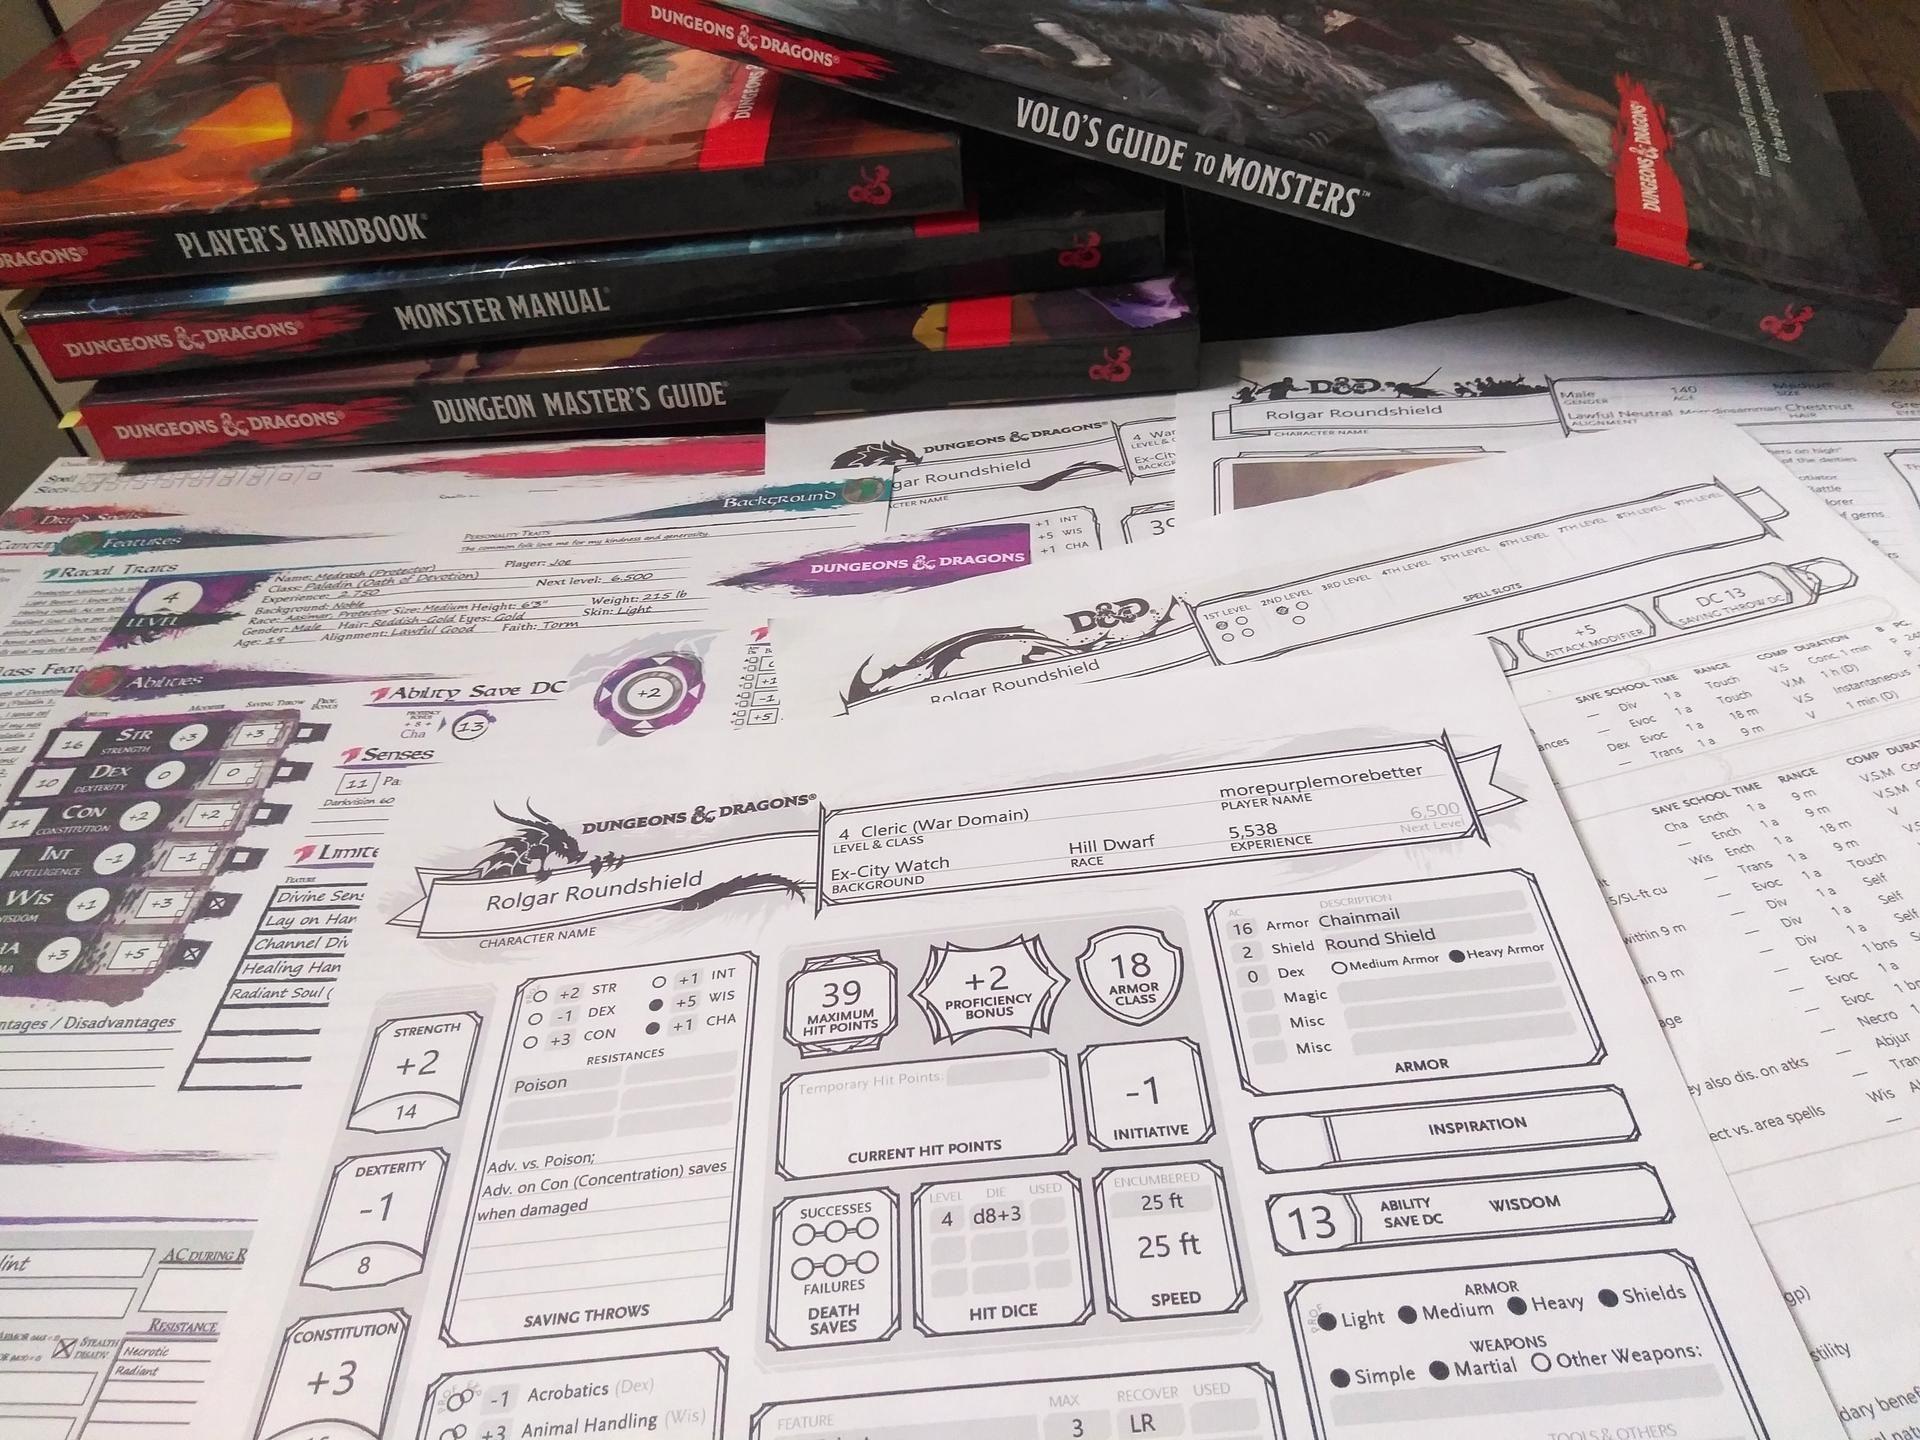 MorePurpleMoreBetter is creating DnD character sheets | Patreon